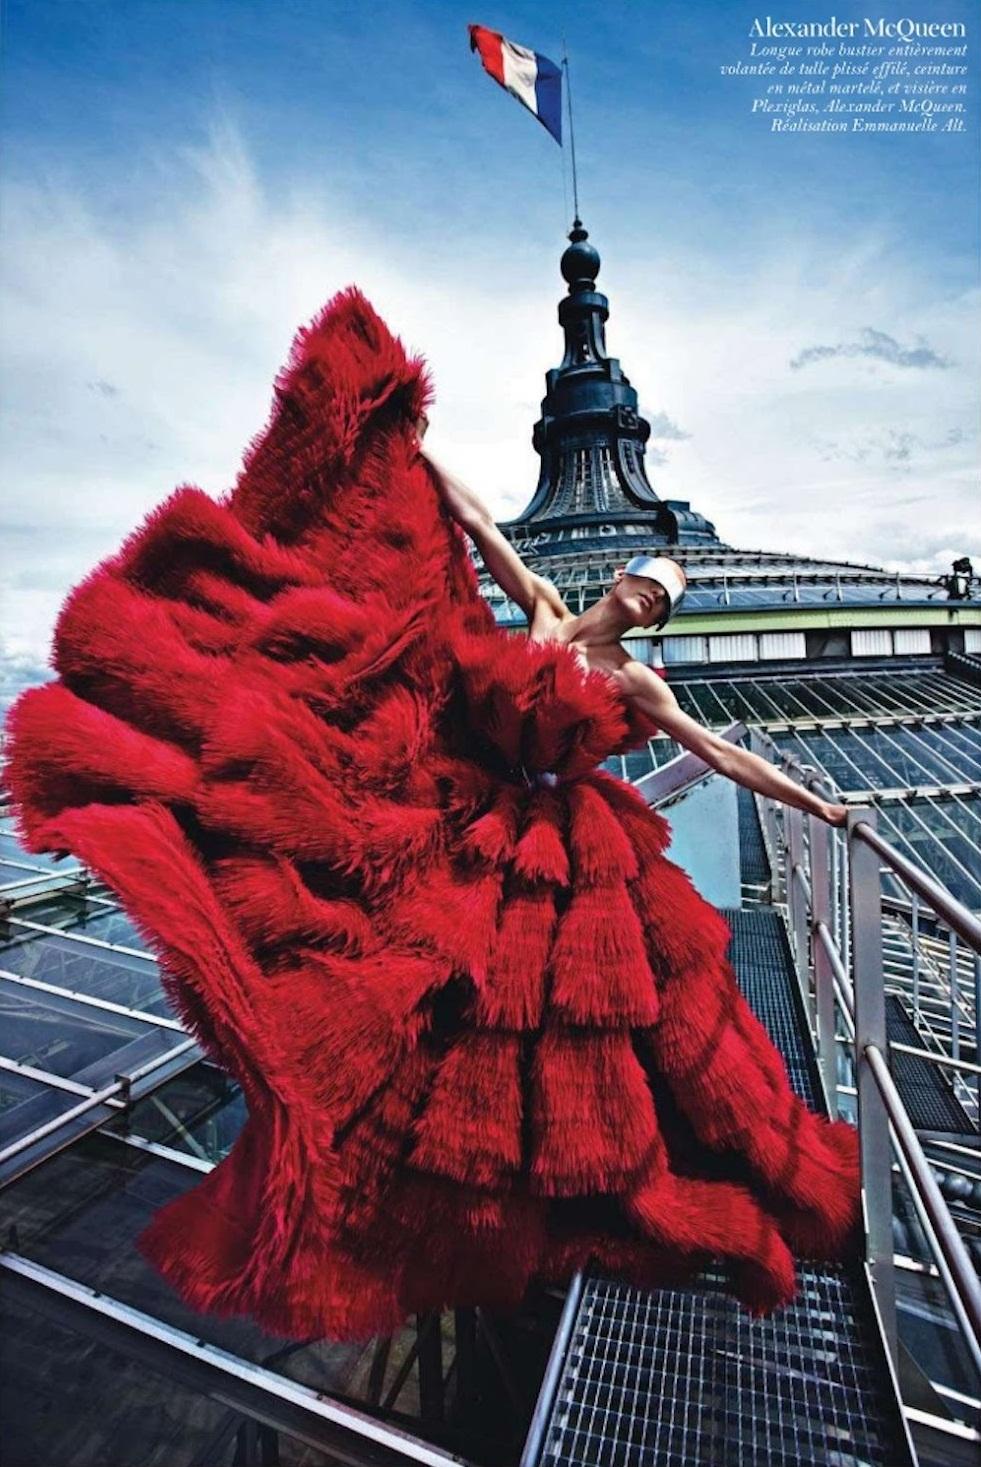 """Paris Mon Amour""   with Ameline Valade + Joe McKenna + Marie Chaix + Emmanuelle Alt + Mario Sorrenti   Frocks = Sarah Burton for Alexander McQueen"